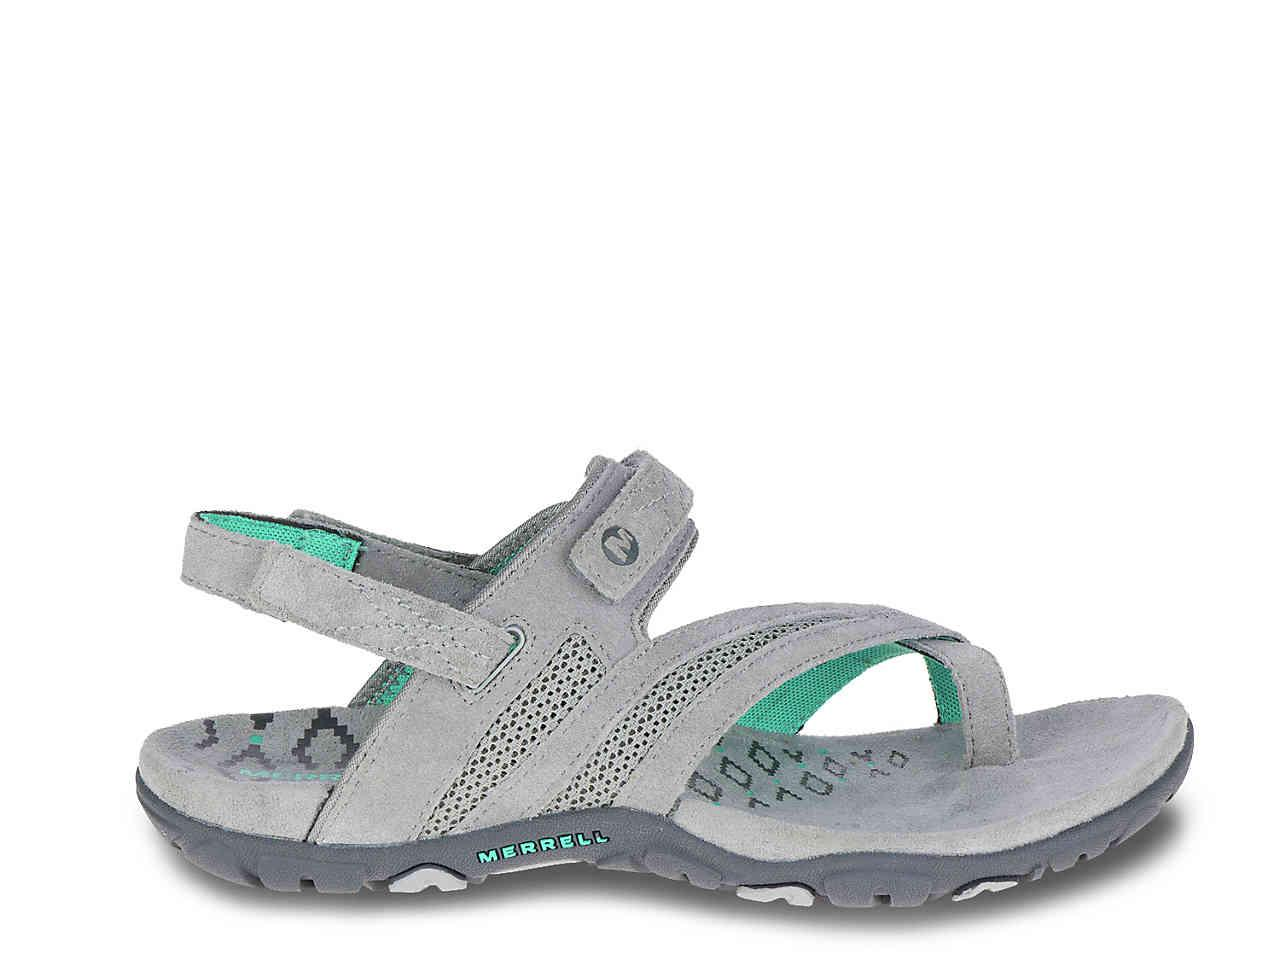 e5528a2e166a Lyst - Merrell Sandspur Delta Sport Sandal in Gray